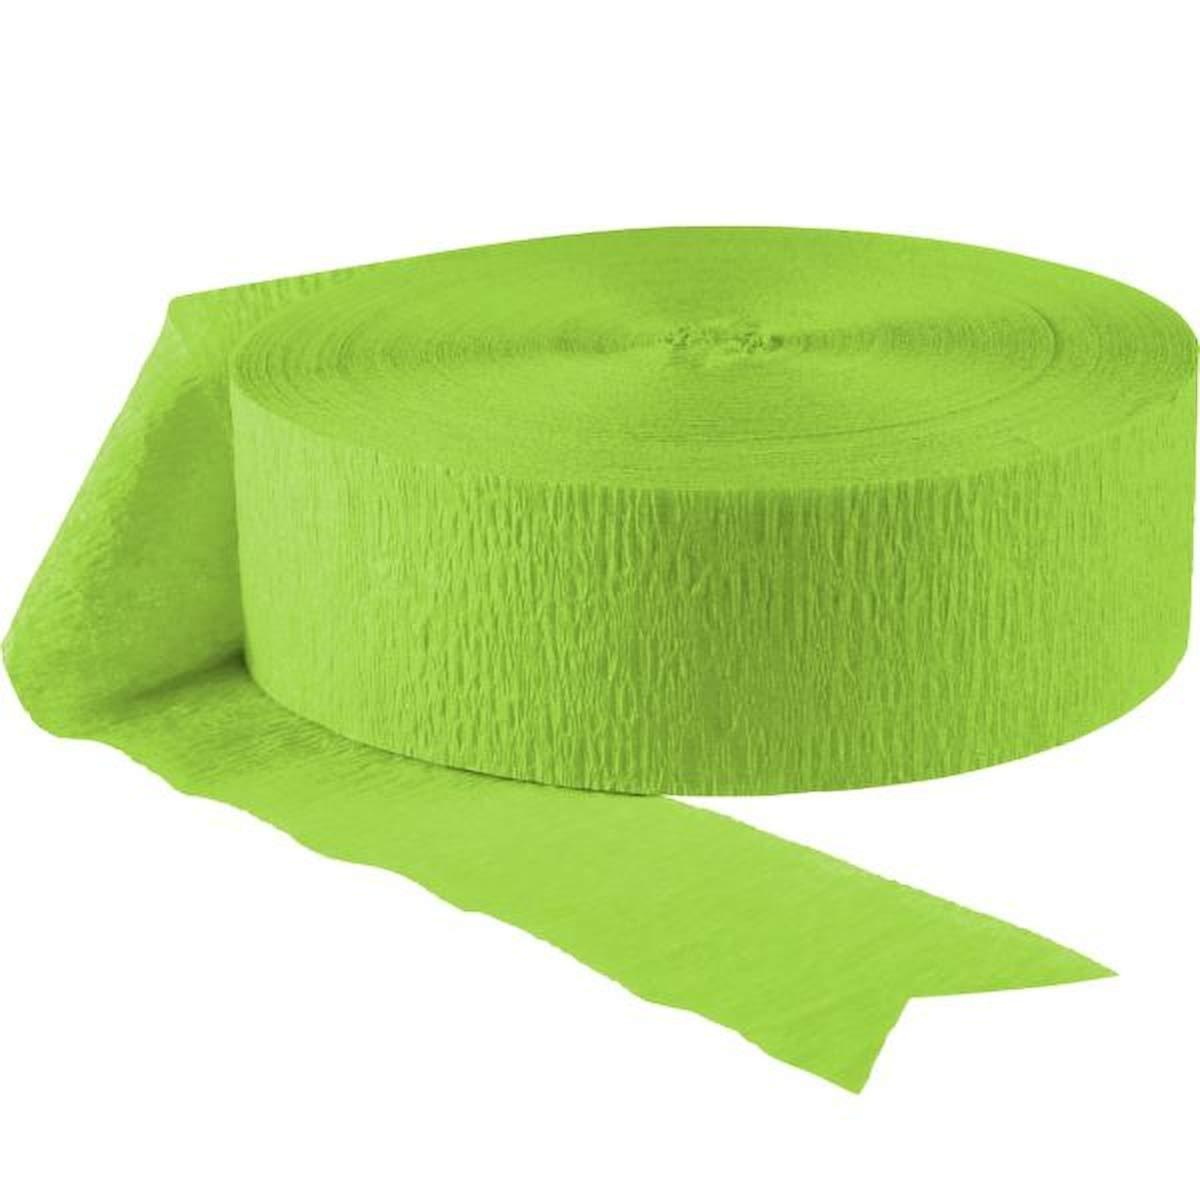 Amscan Jumbo Roll Party Crepe Streamer   Kiwi Green   500'   Party Decor   12 Ct.